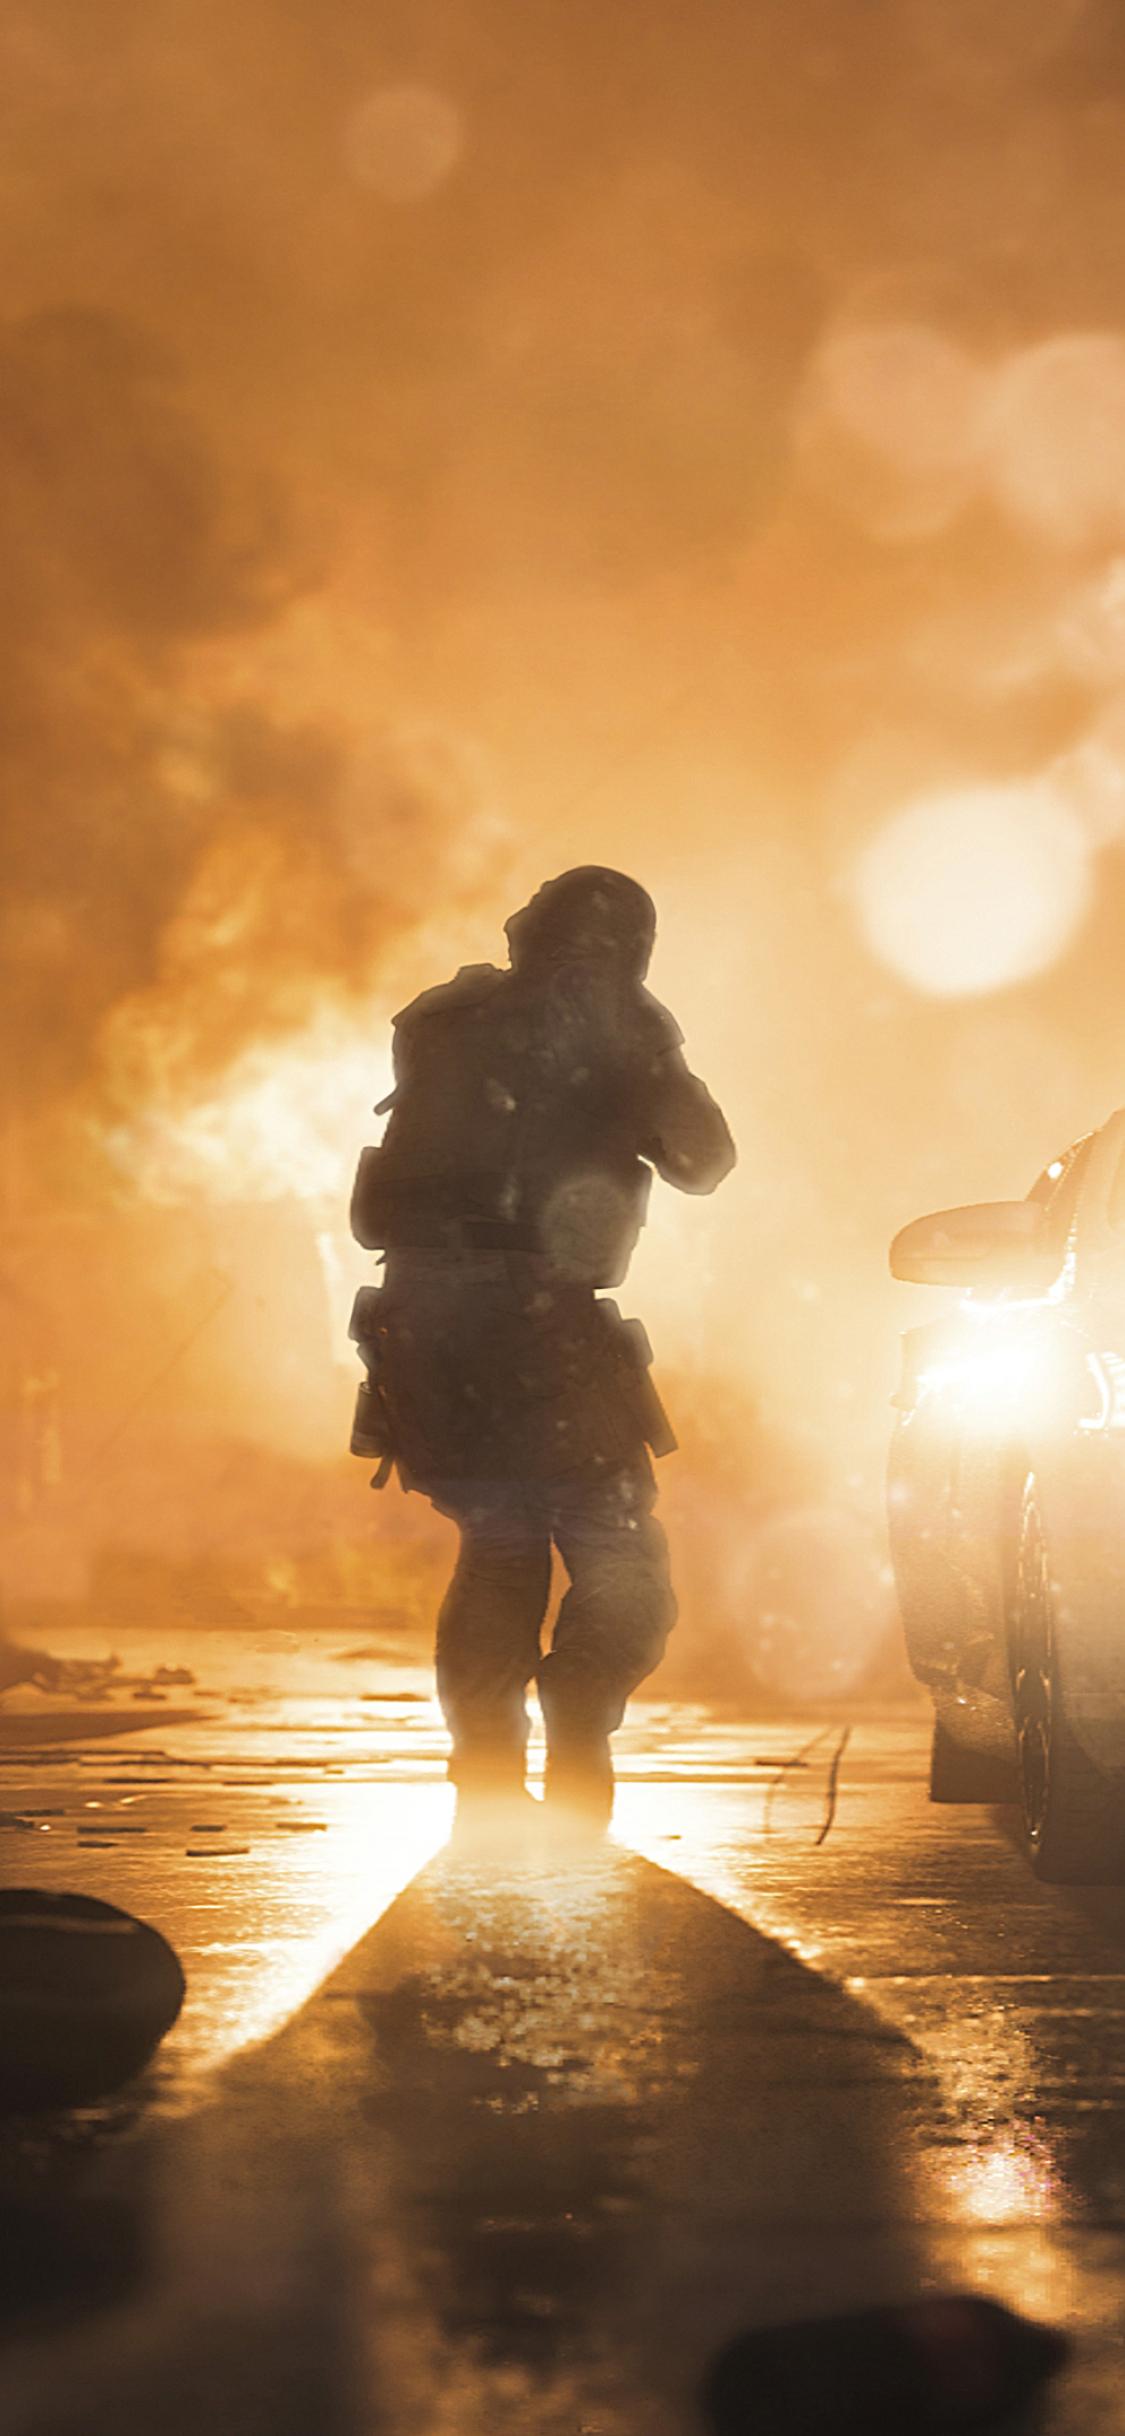 1125x2436 Call Of Duty Modern Warfare 2019 Iphone Xs Iphone 10